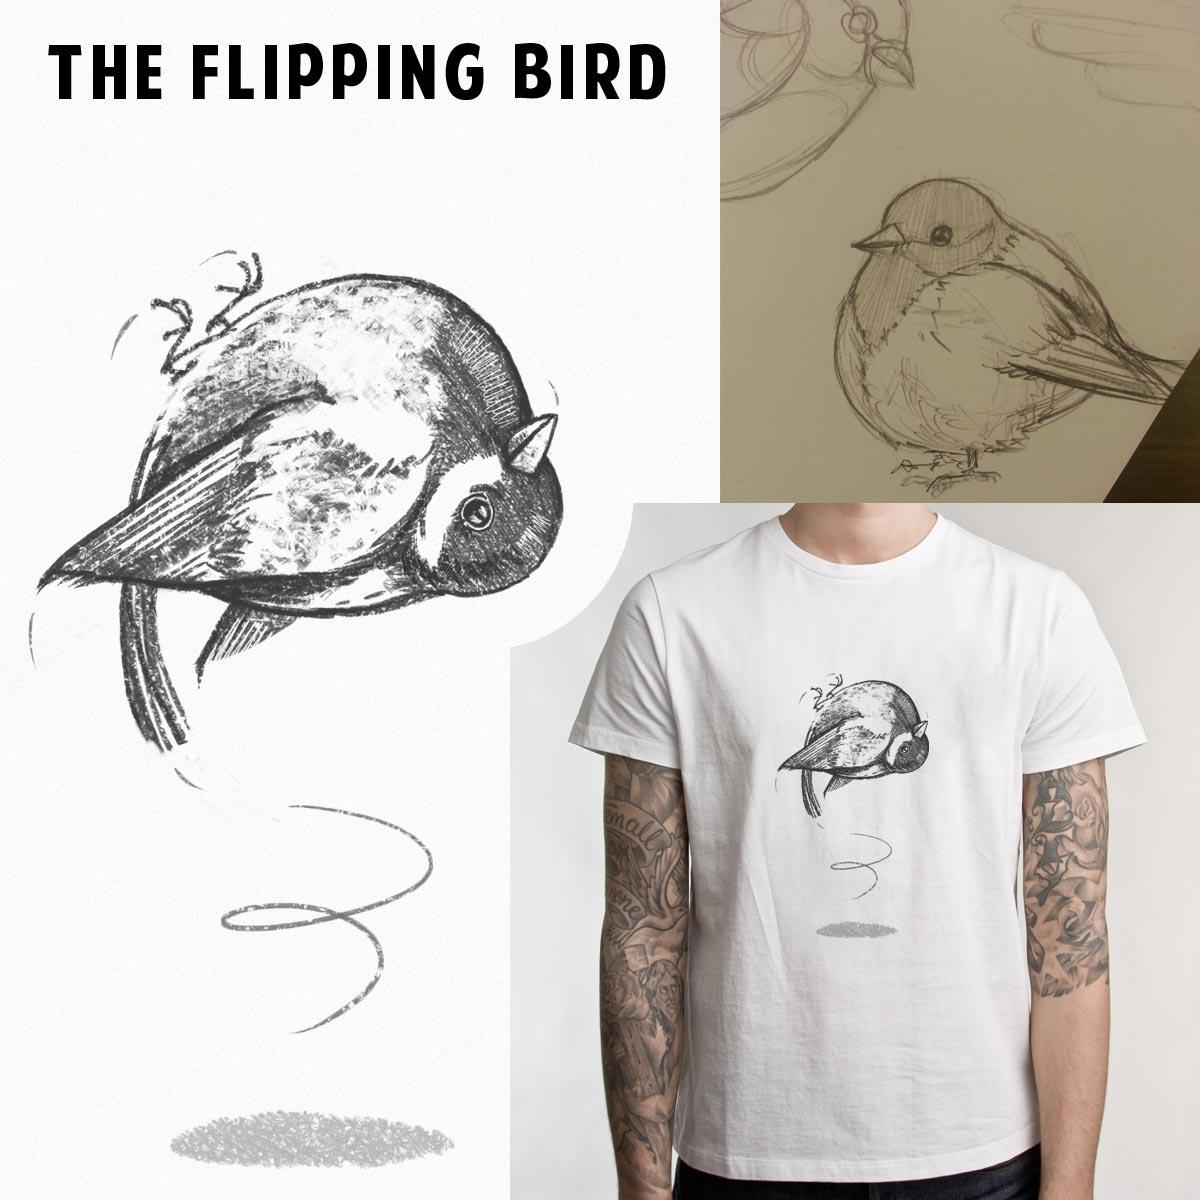 The Flipping Bird by Ellsswhere on Threadless